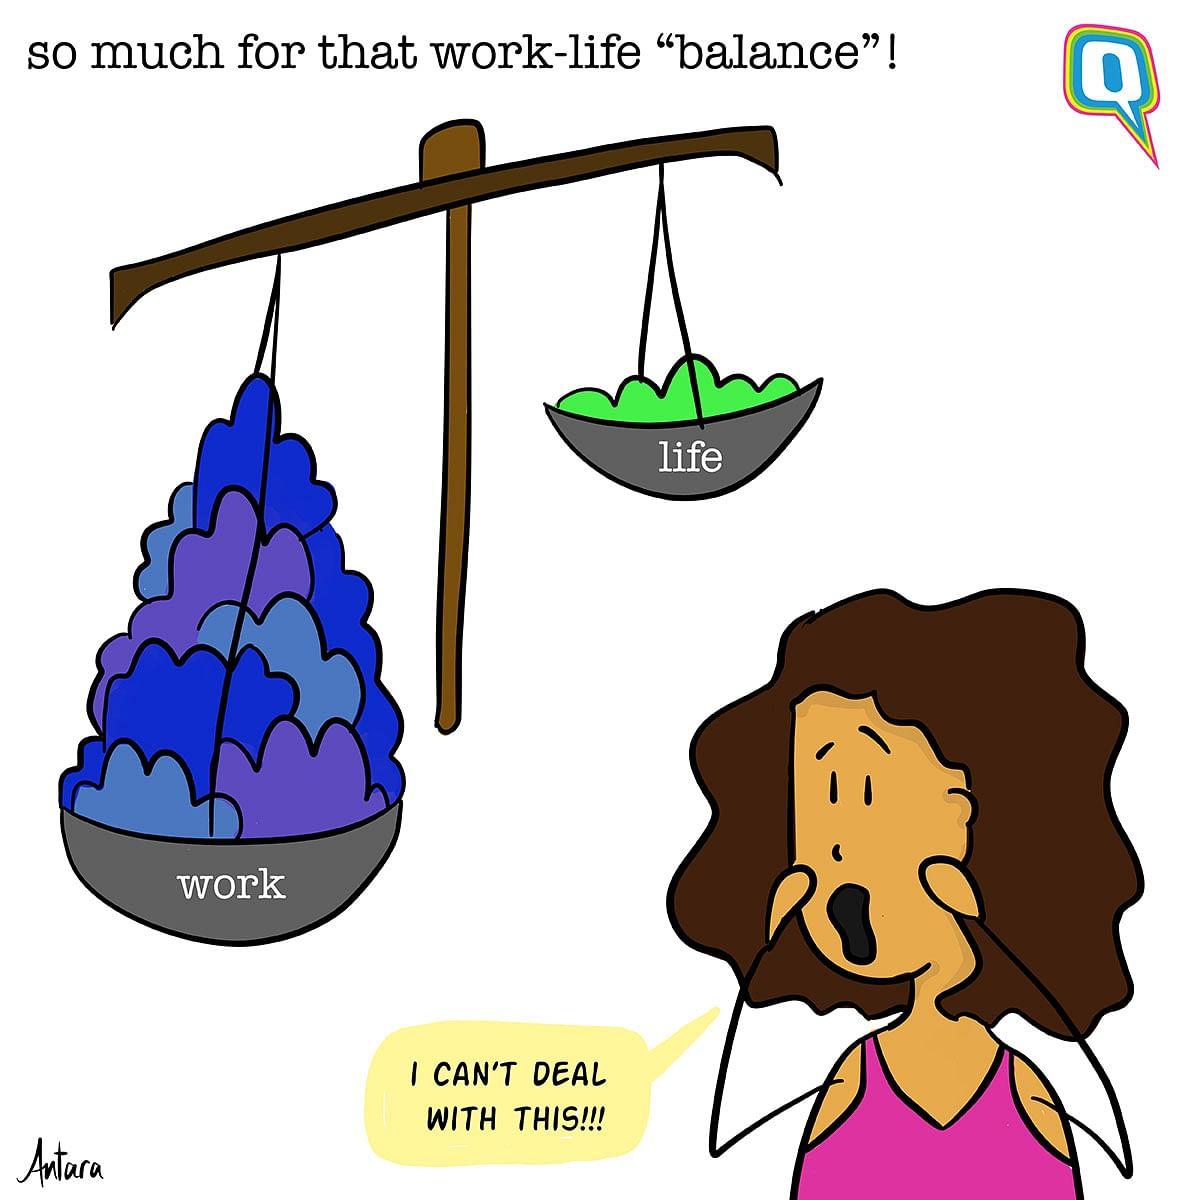 Antara's Comics: Is the Work-Life Balance a Myth?